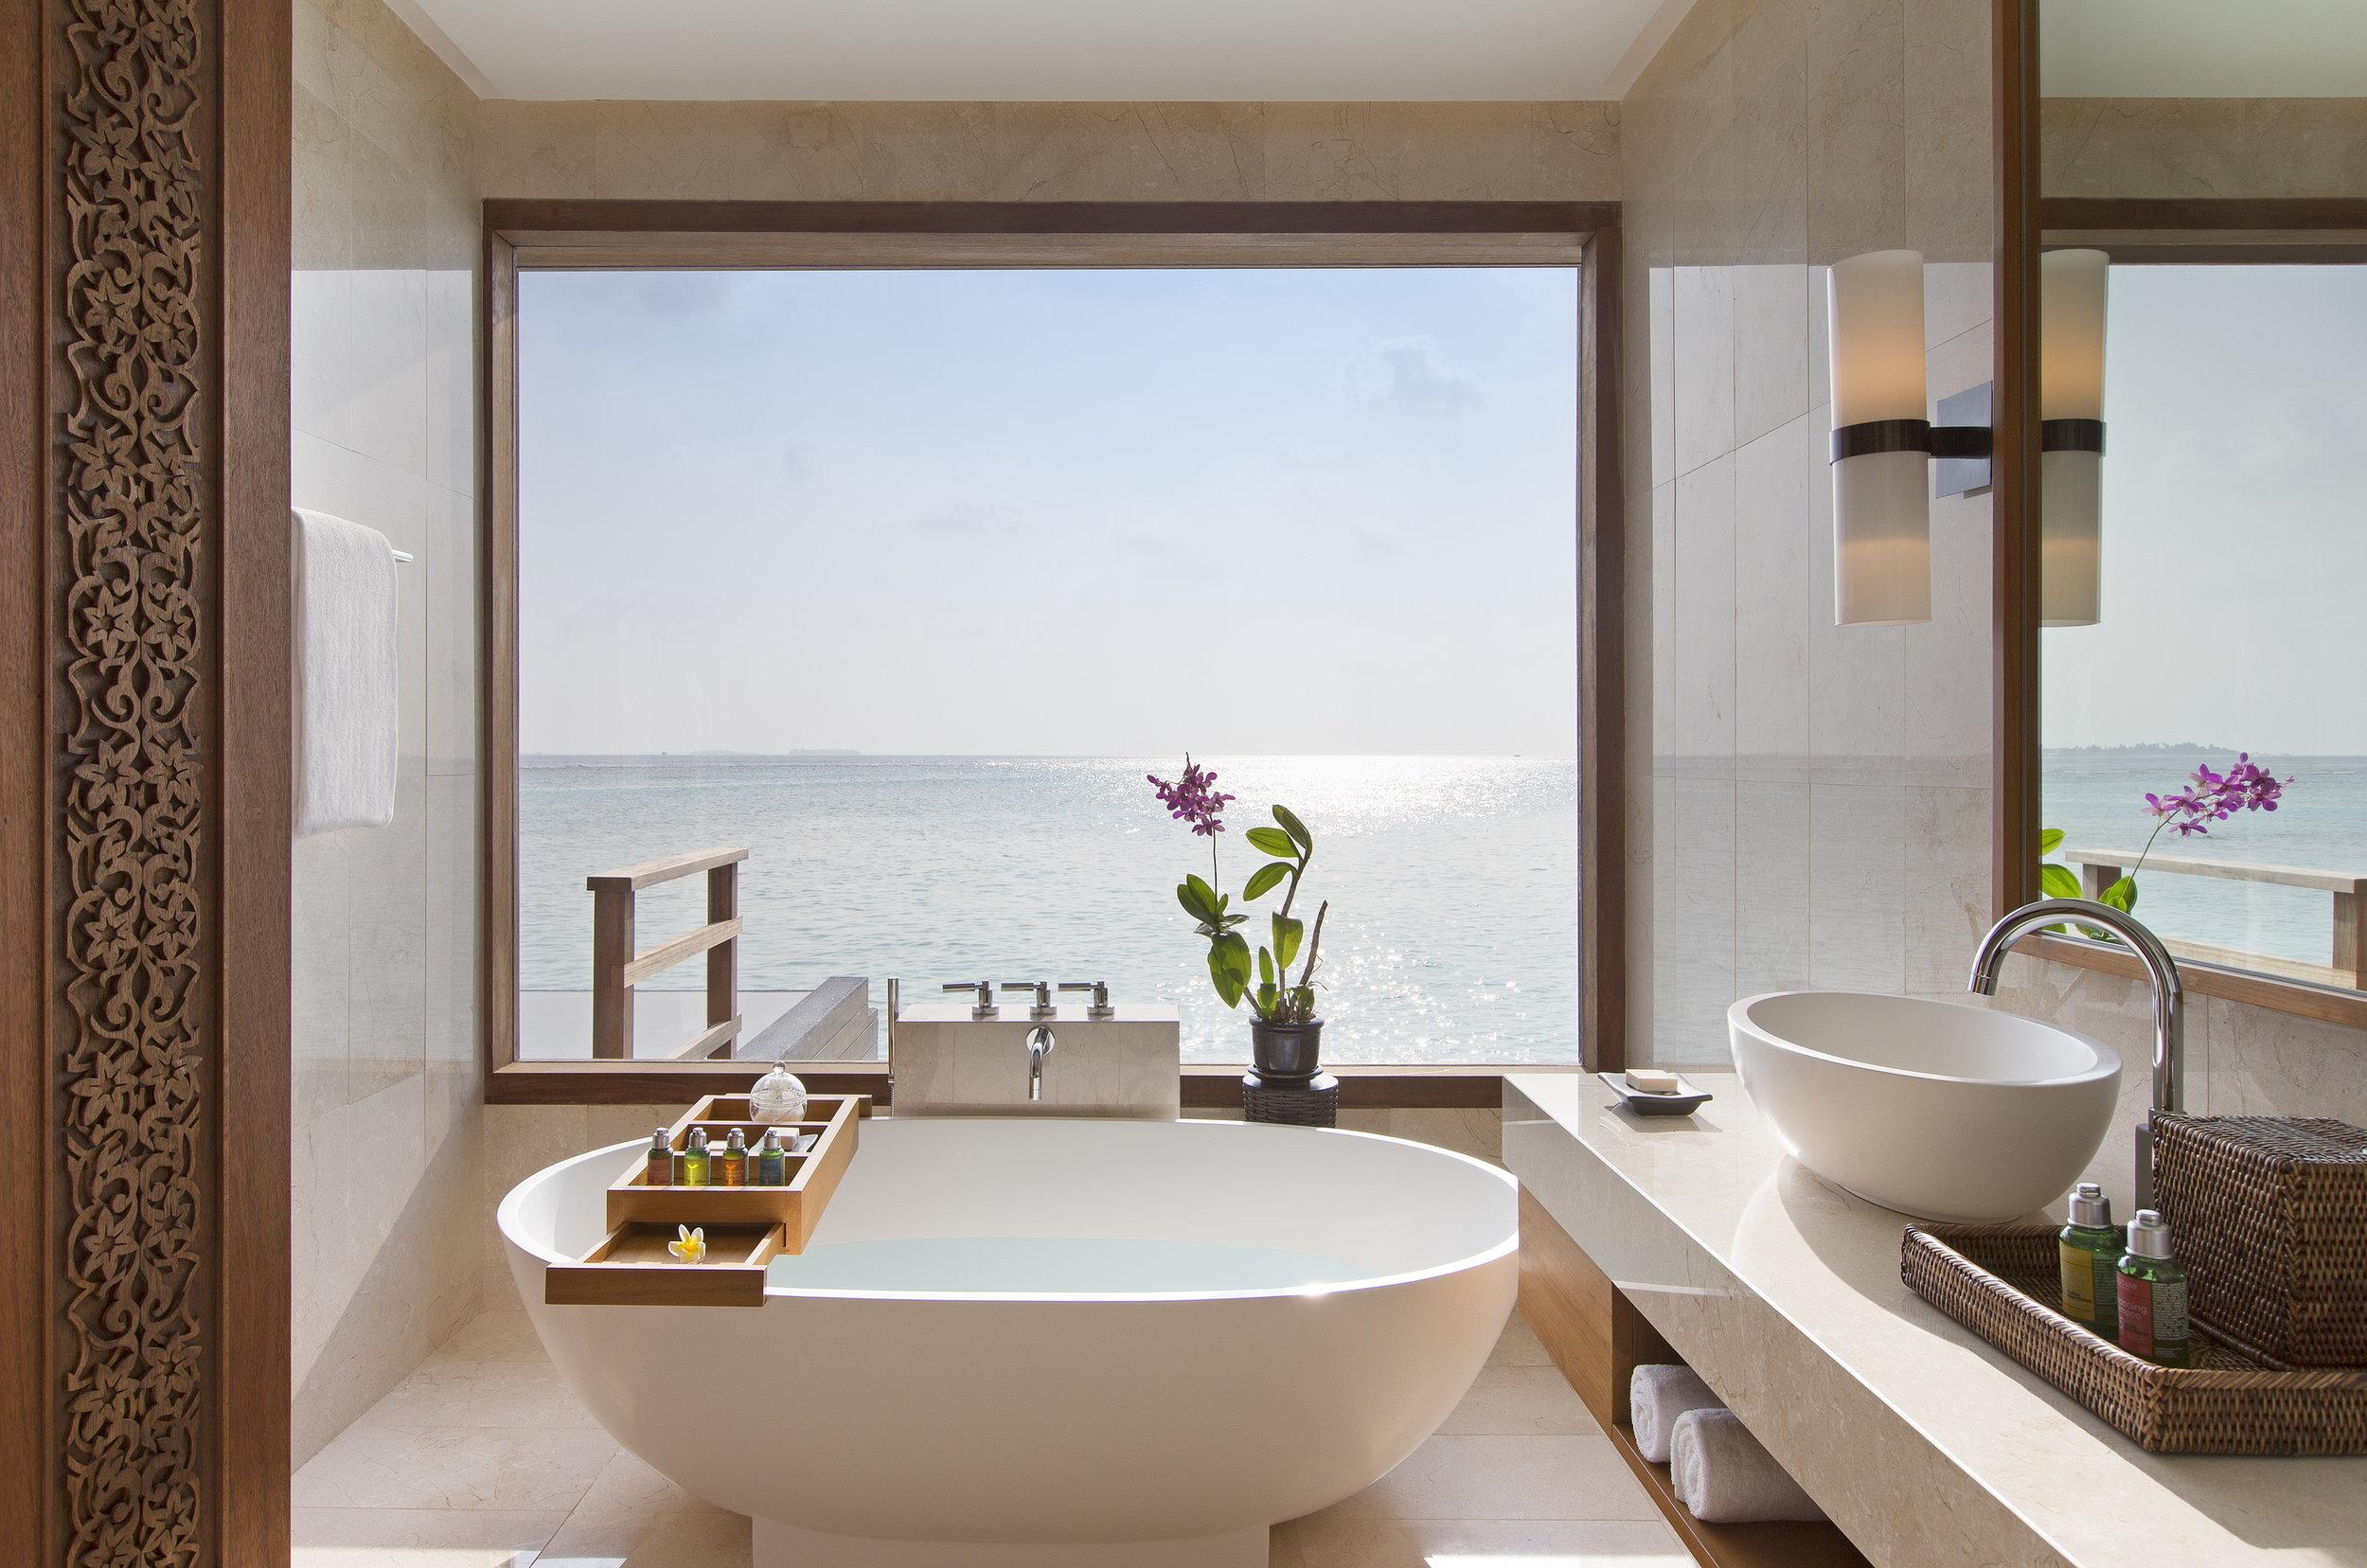 Anantara Veli Resort & Spa_ Deluxe Over Water Pool Bungalow bathroom.jpg